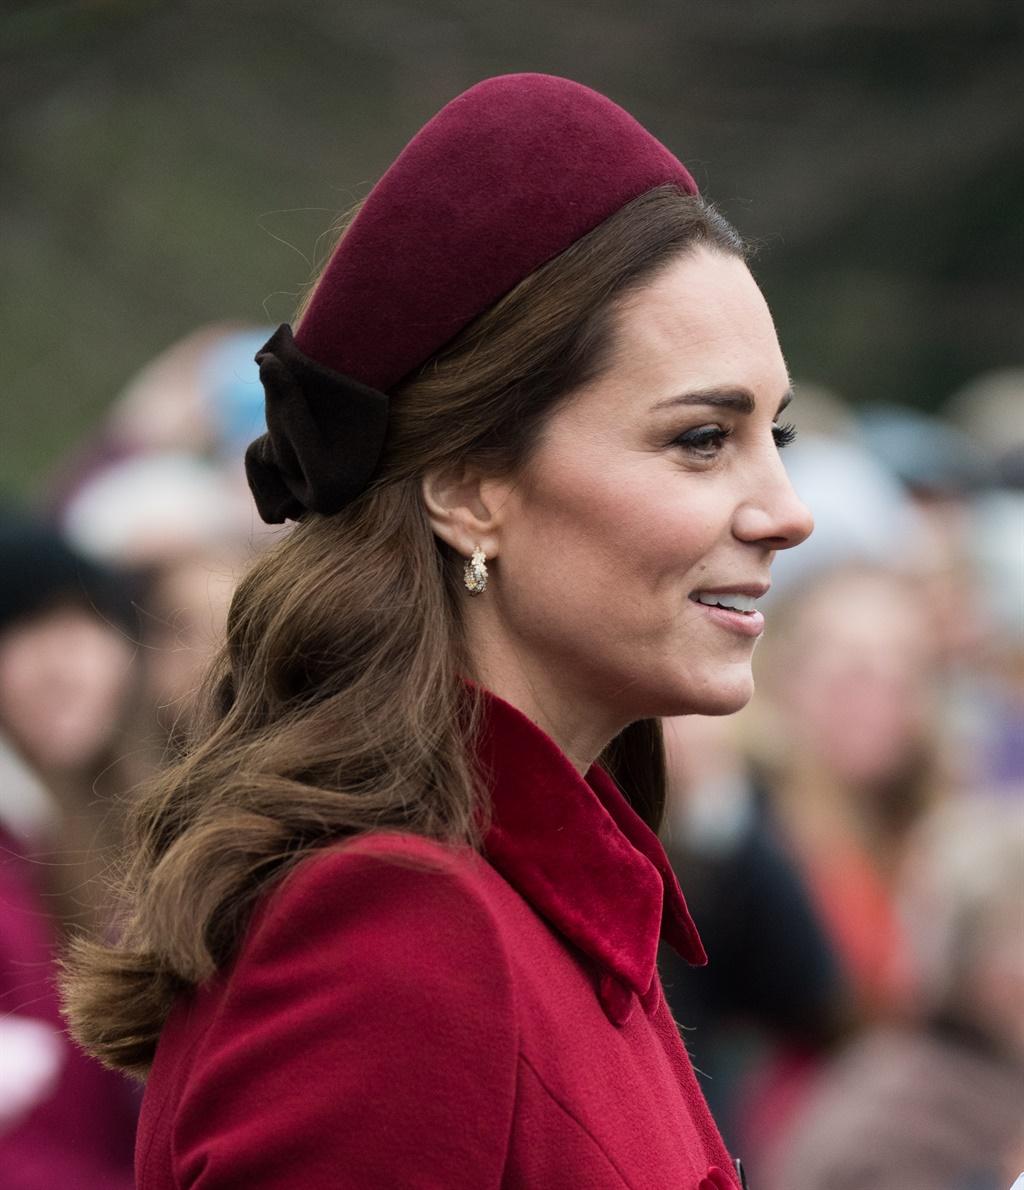 KING'S LYNN, ENGLAND - DECEMBER 25: Catherine, Duc